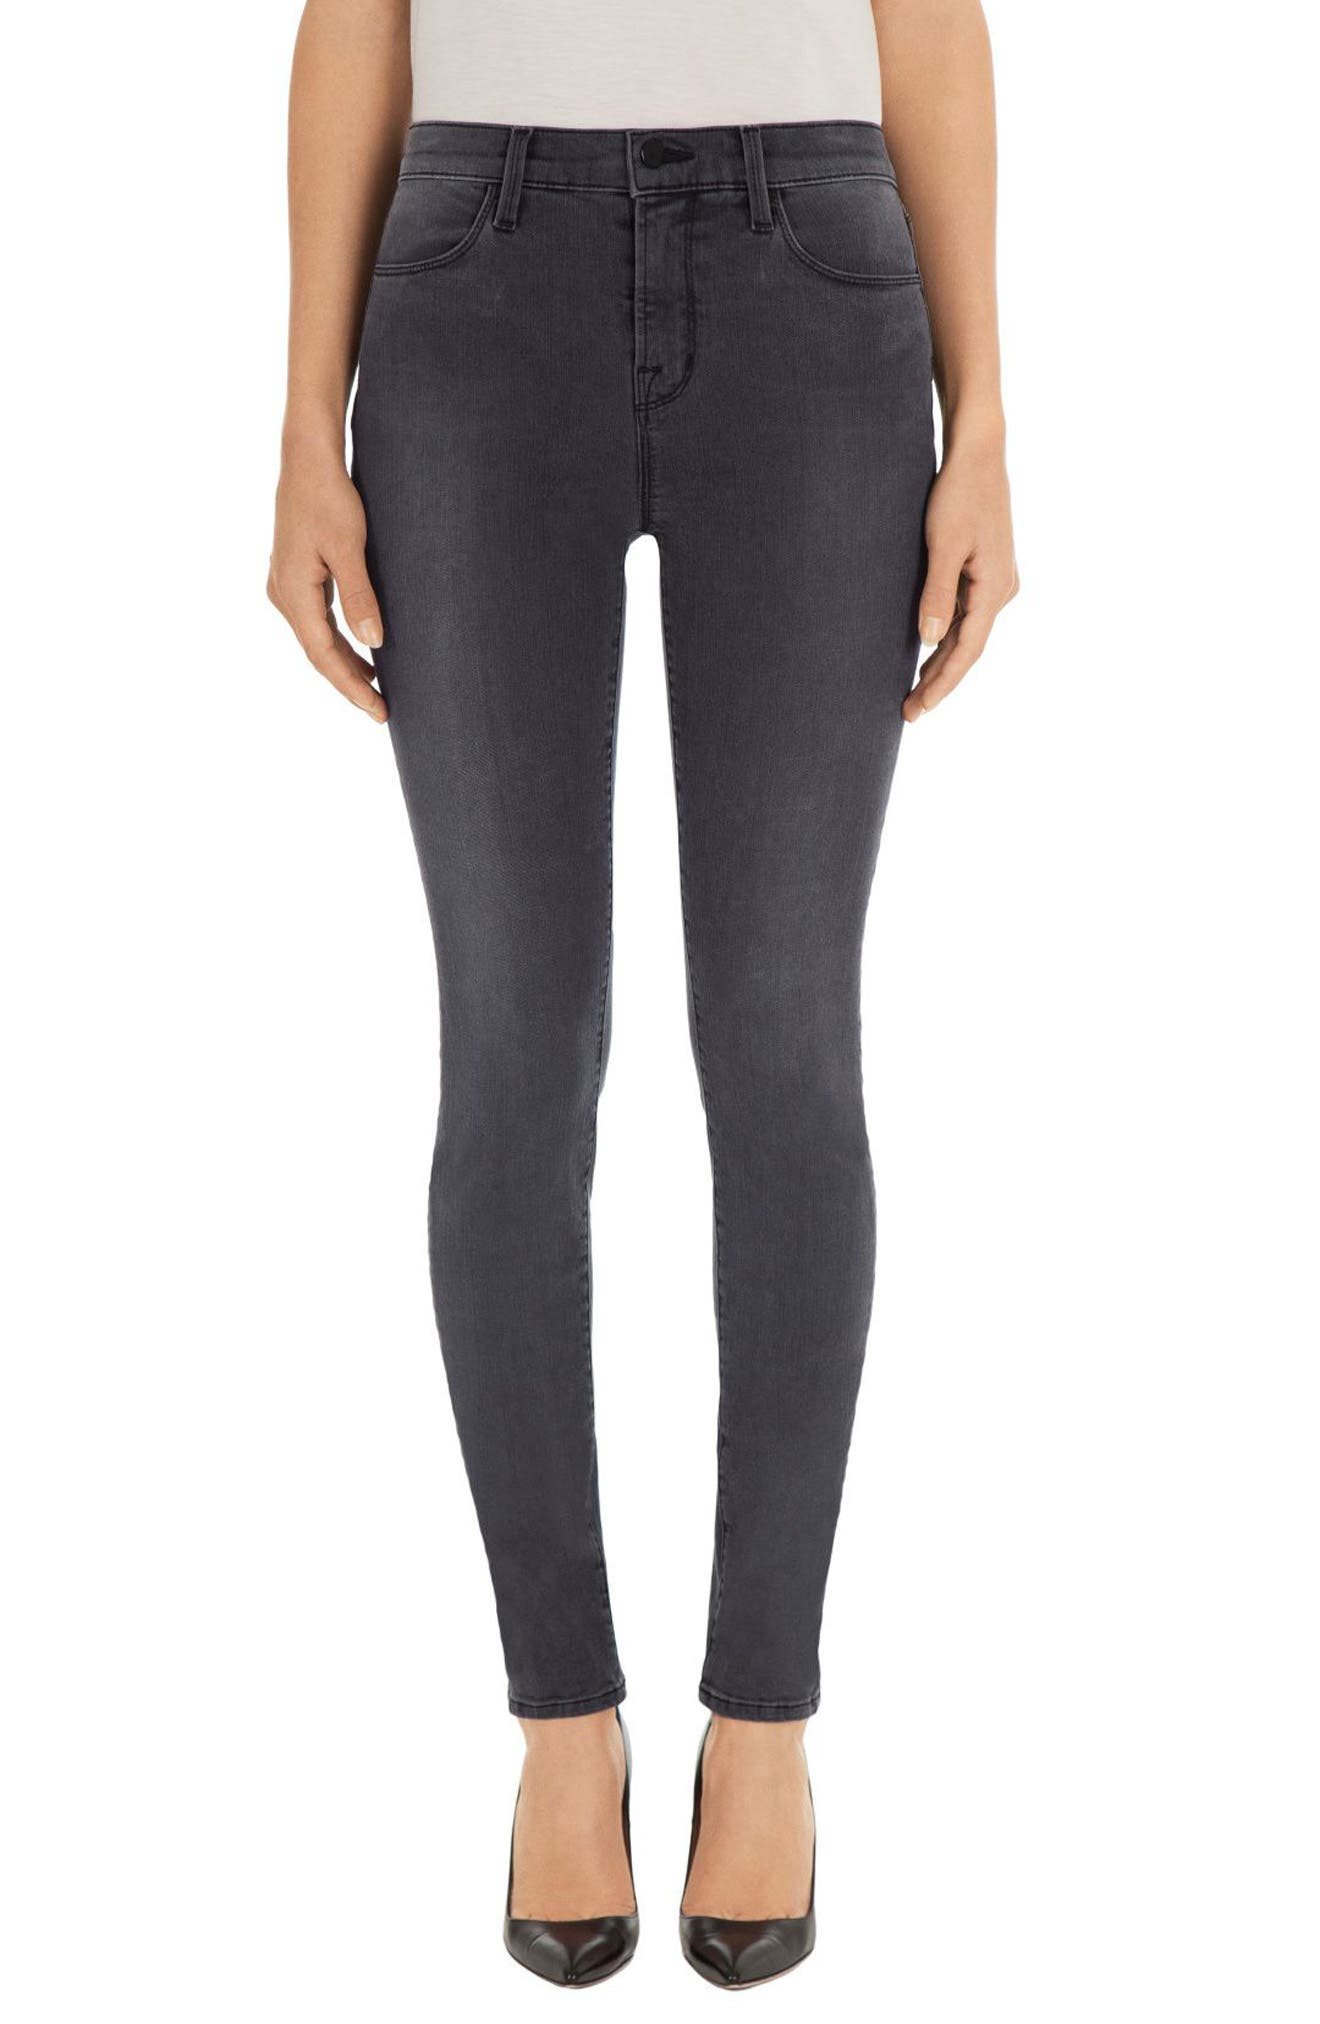 Alternate Image 1 Selected - J Brand Maria High Waist Skinny Jeans (Nightbird)